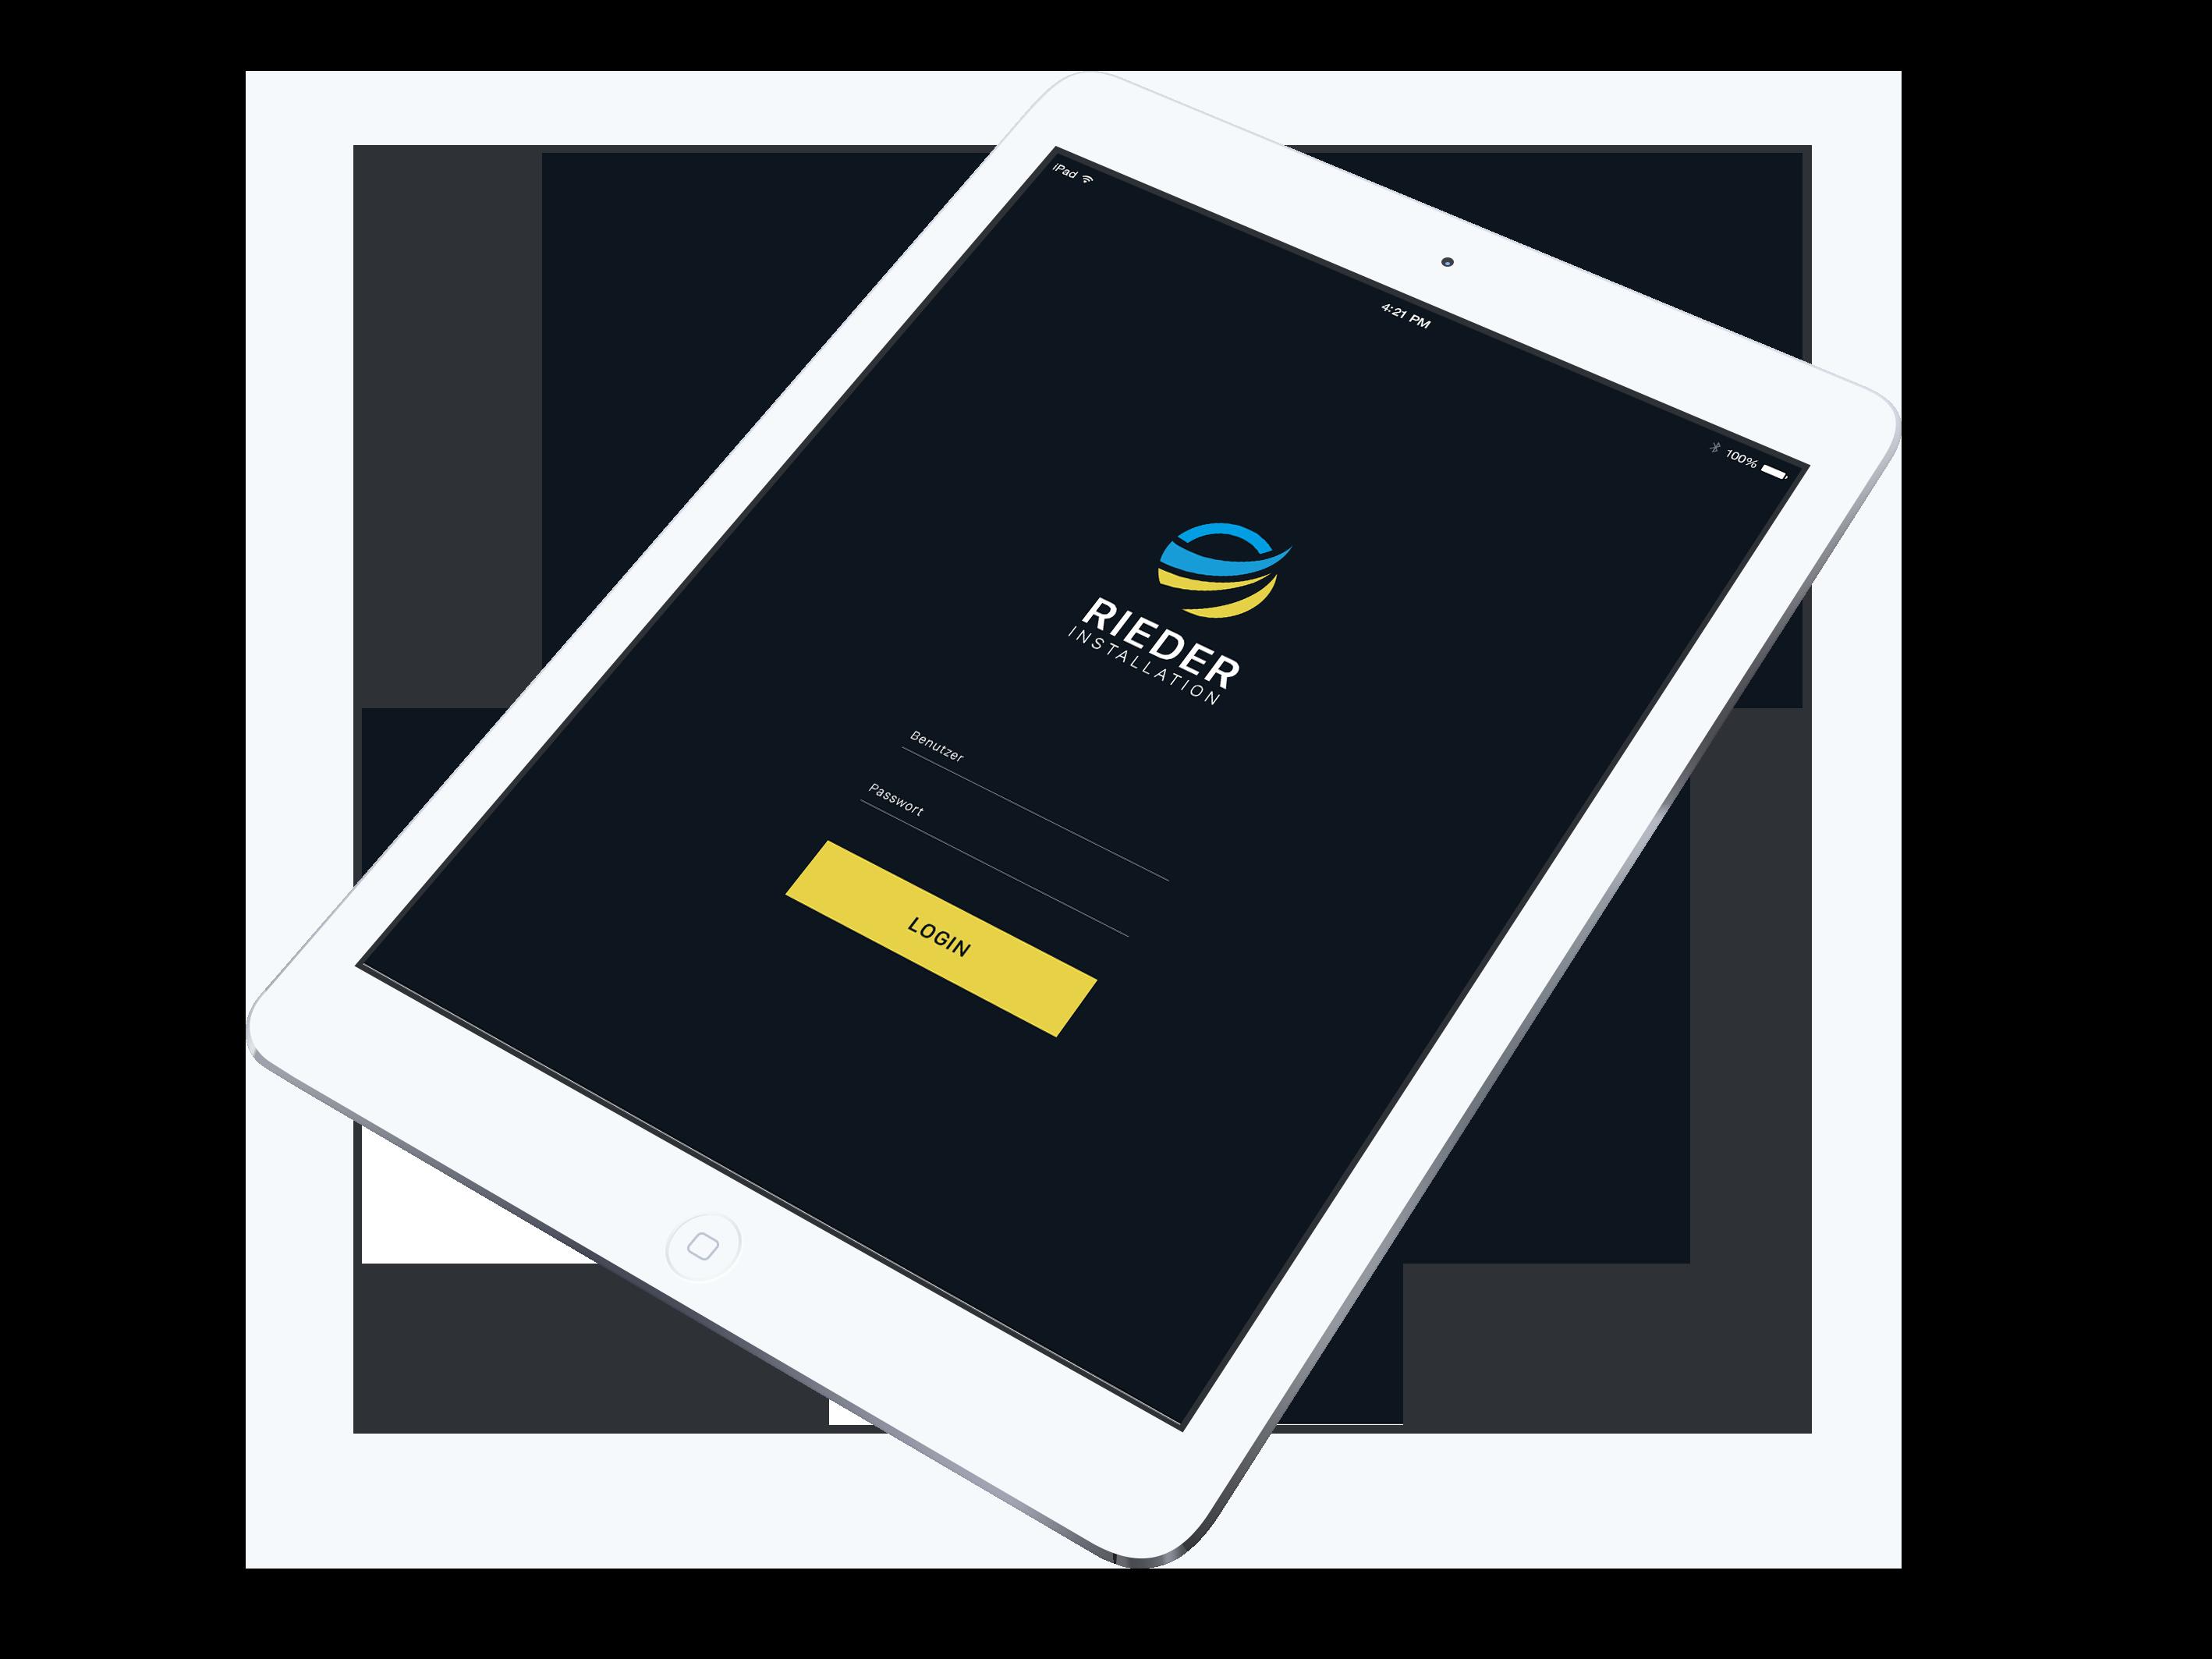 rieder-ipad-app-1